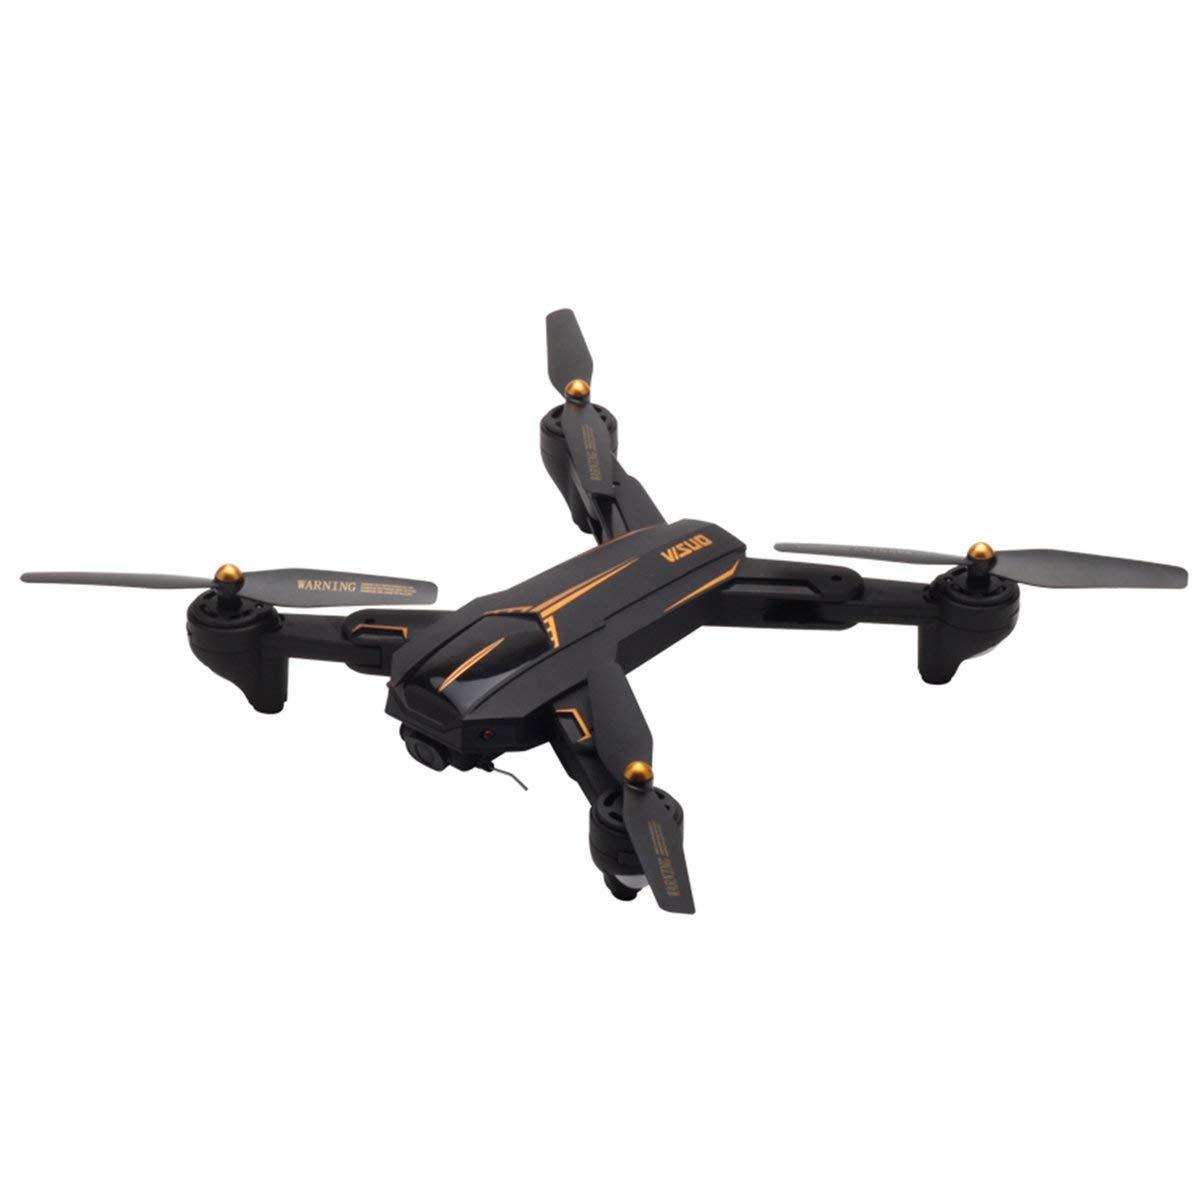 Gugutogo Drohne mit Kamera XS812 Faltbare GPS Quadcopter RC Drohne mit 2MP HD Kamera WiFi + GPS Flugzeuge